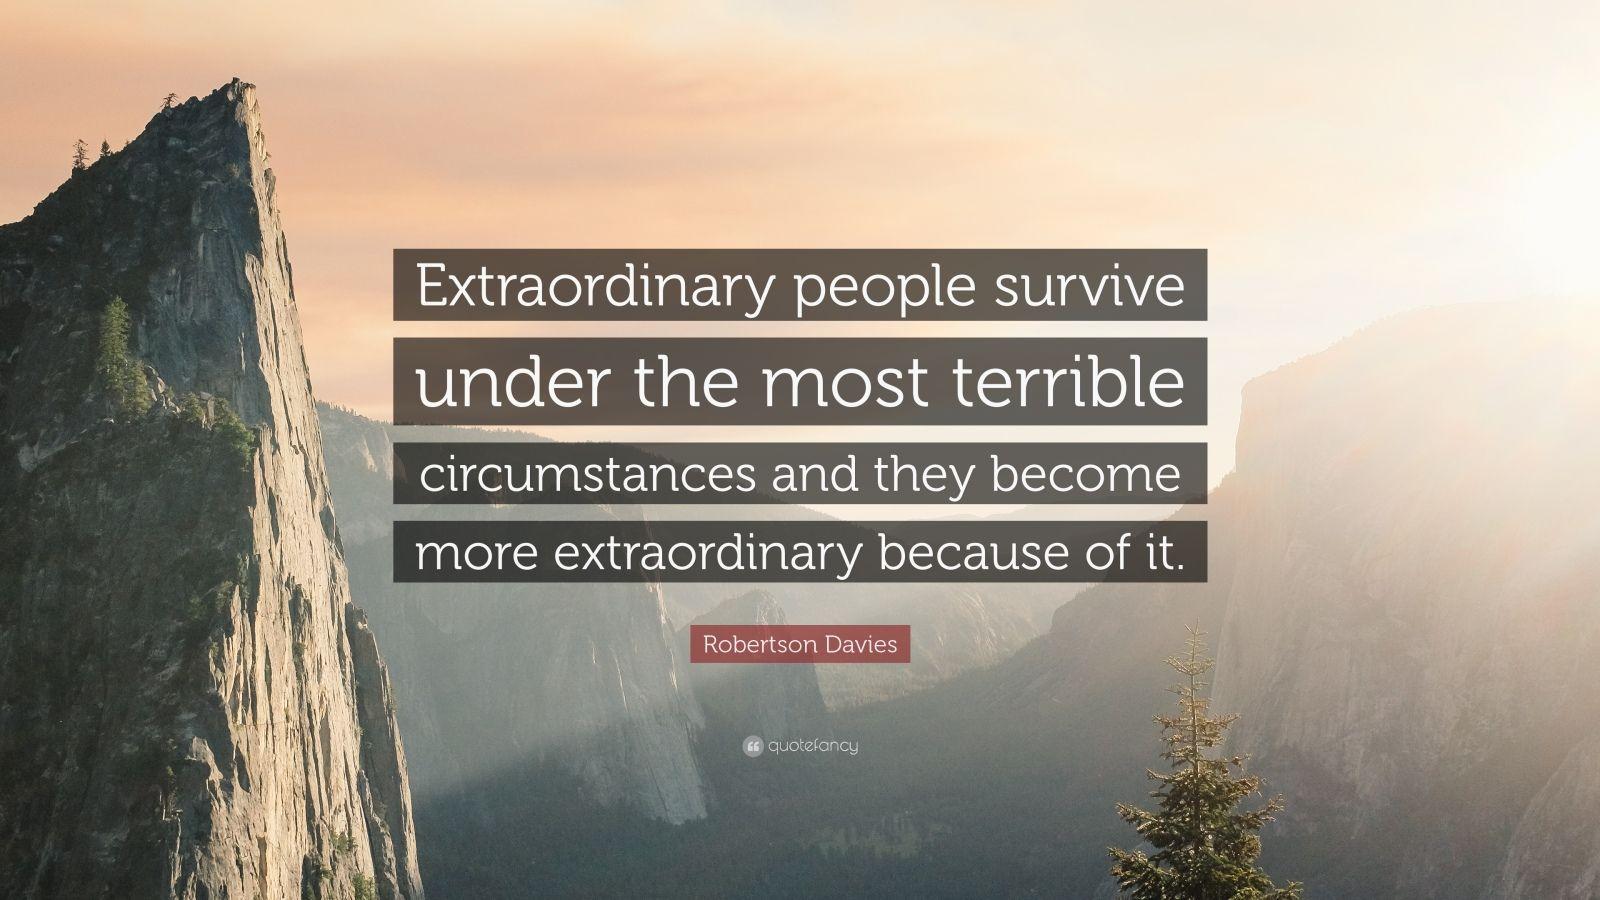 Conor Mcgregor Quote Wallpaper Robertson Davies Quote Extraordinary People Survive